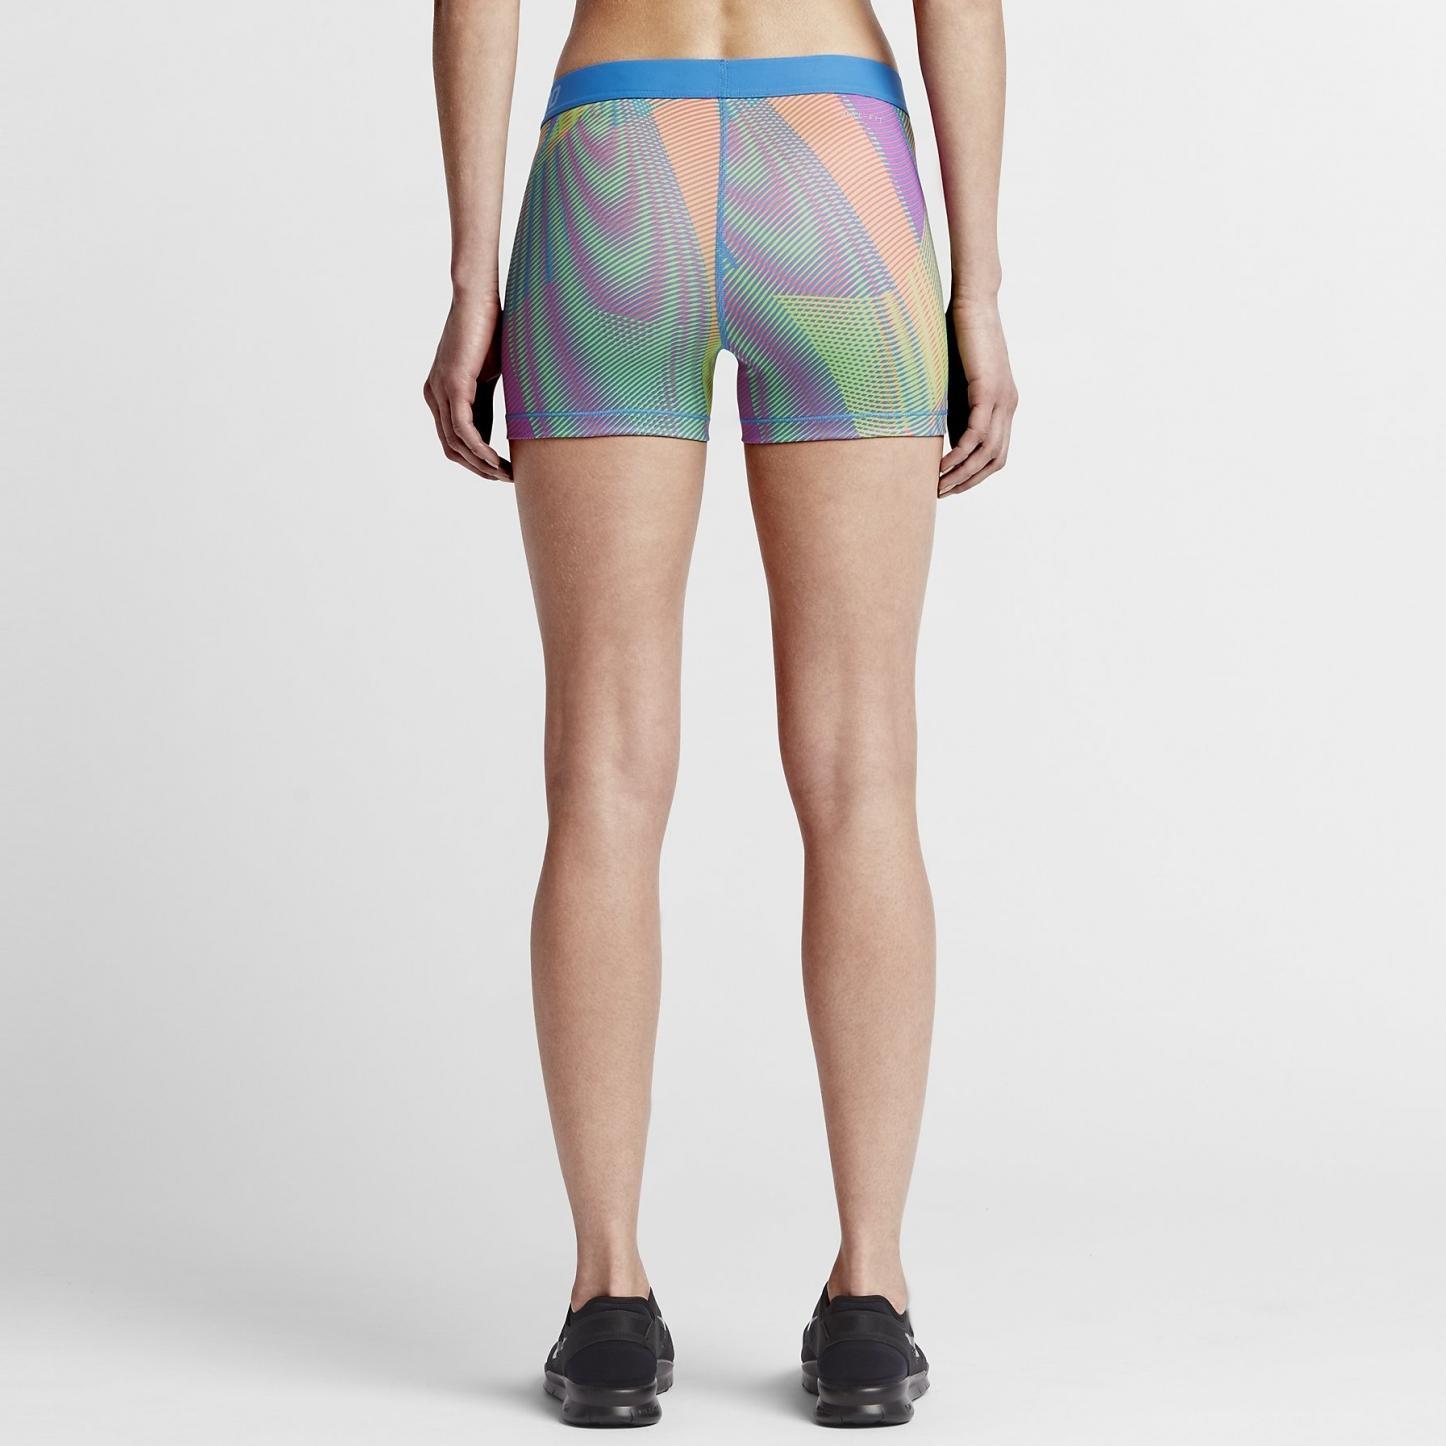 sport klingenmaier nike pro hypercool frequency shorts damen bunt online kaufen. Black Bedroom Furniture Sets. Home Design Ideas